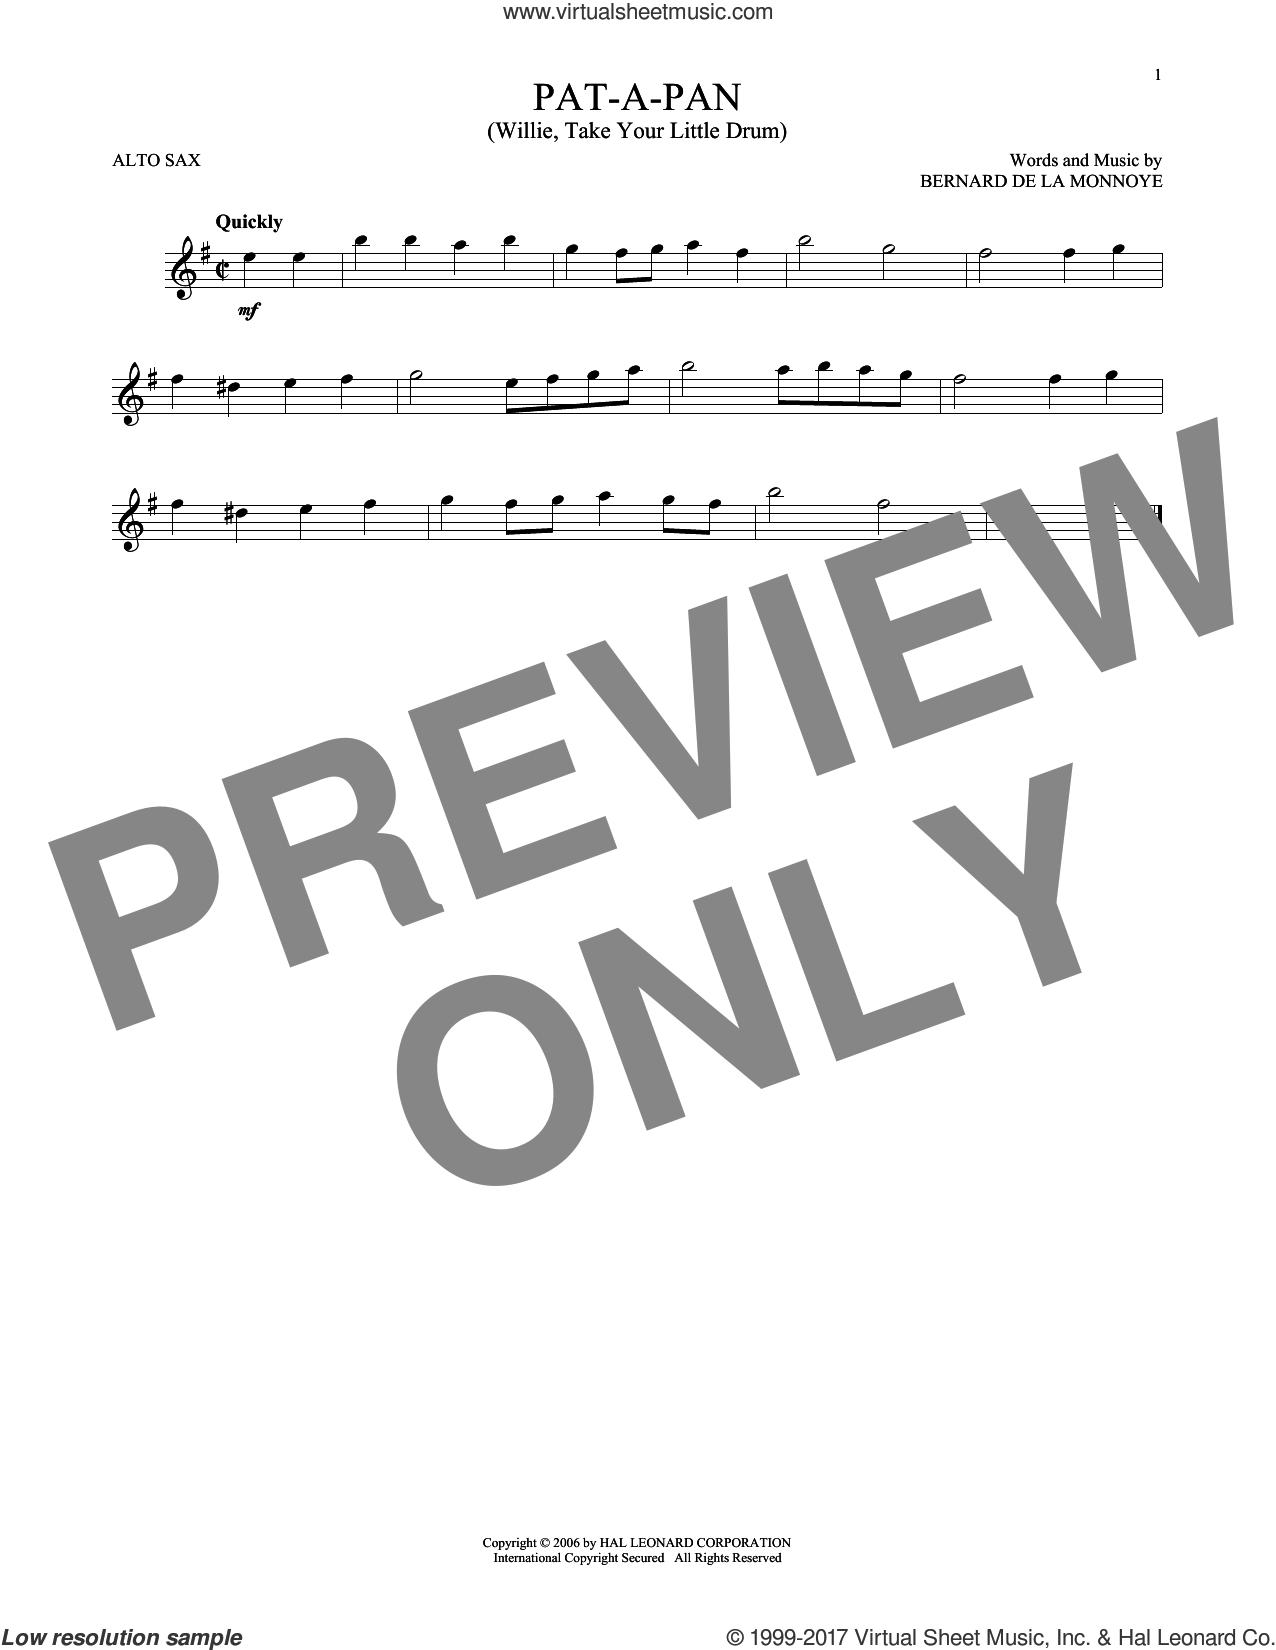 Pat-A-Pan (Willie, Take Your Little Drum) sheet music for alto saxophone solo by Bernard de la Monnoye, intermediate skill level